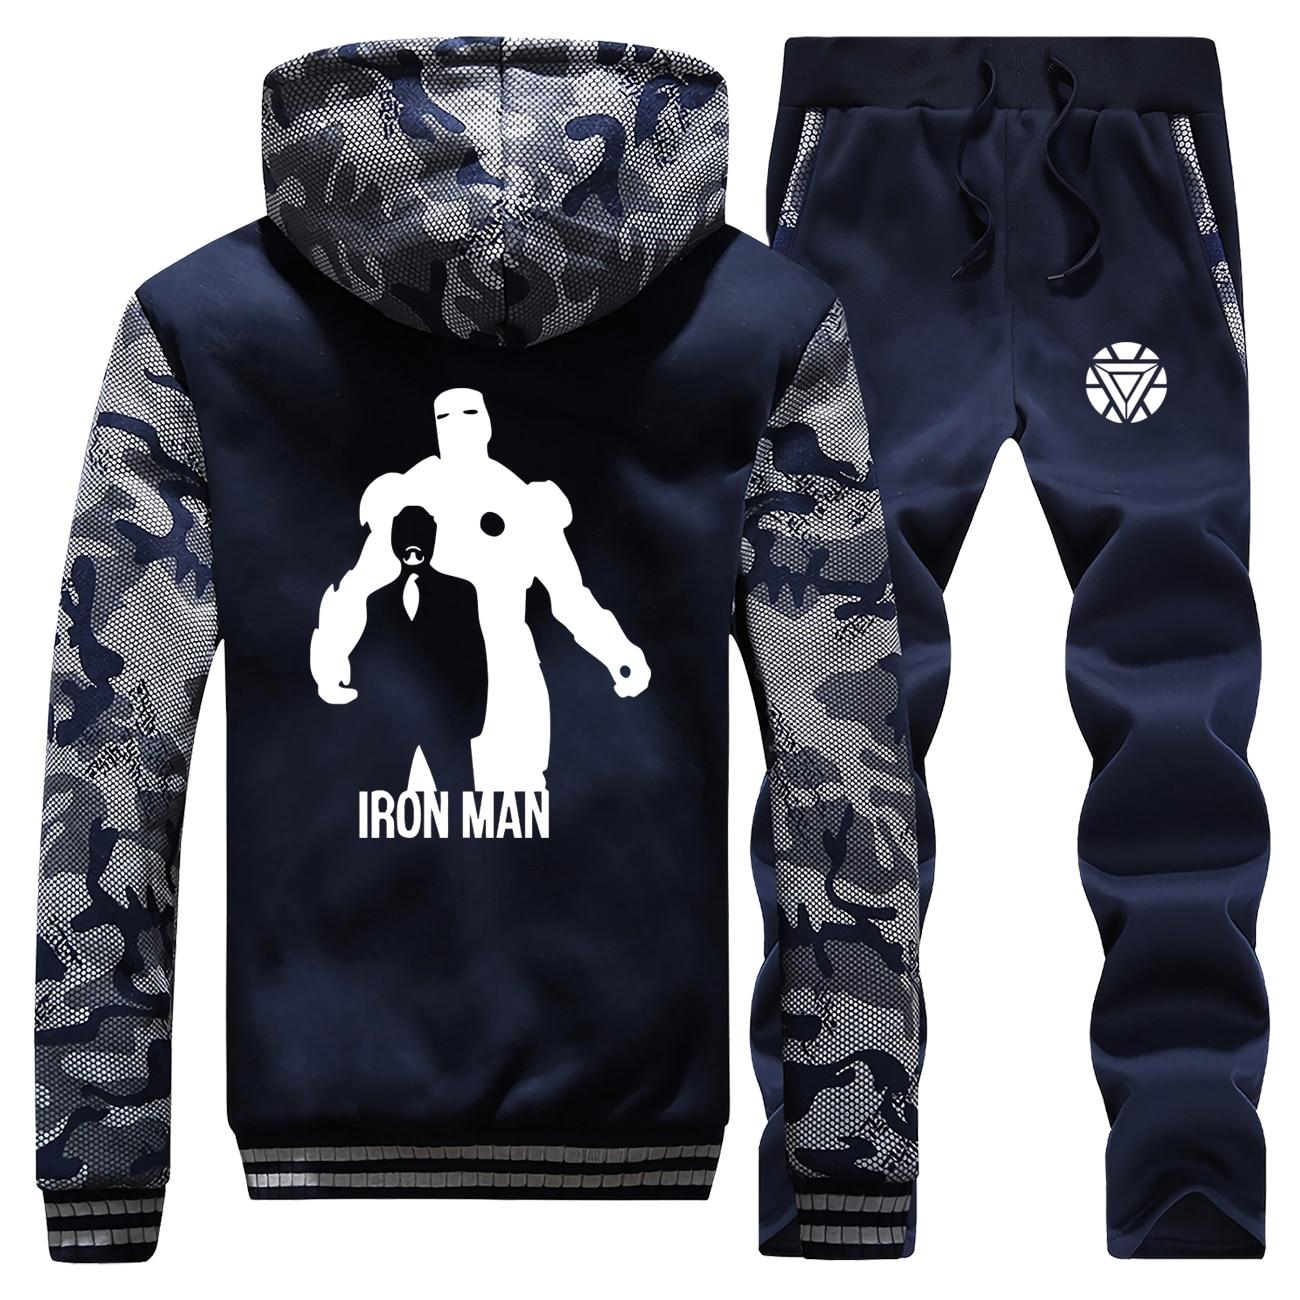 The Avengers Iron Man Tracksuit Winter Men Set Thick Fleece Jackets + Pants 2 Pieces Sets Male Warm Hoodies Suit Mens Sportswear